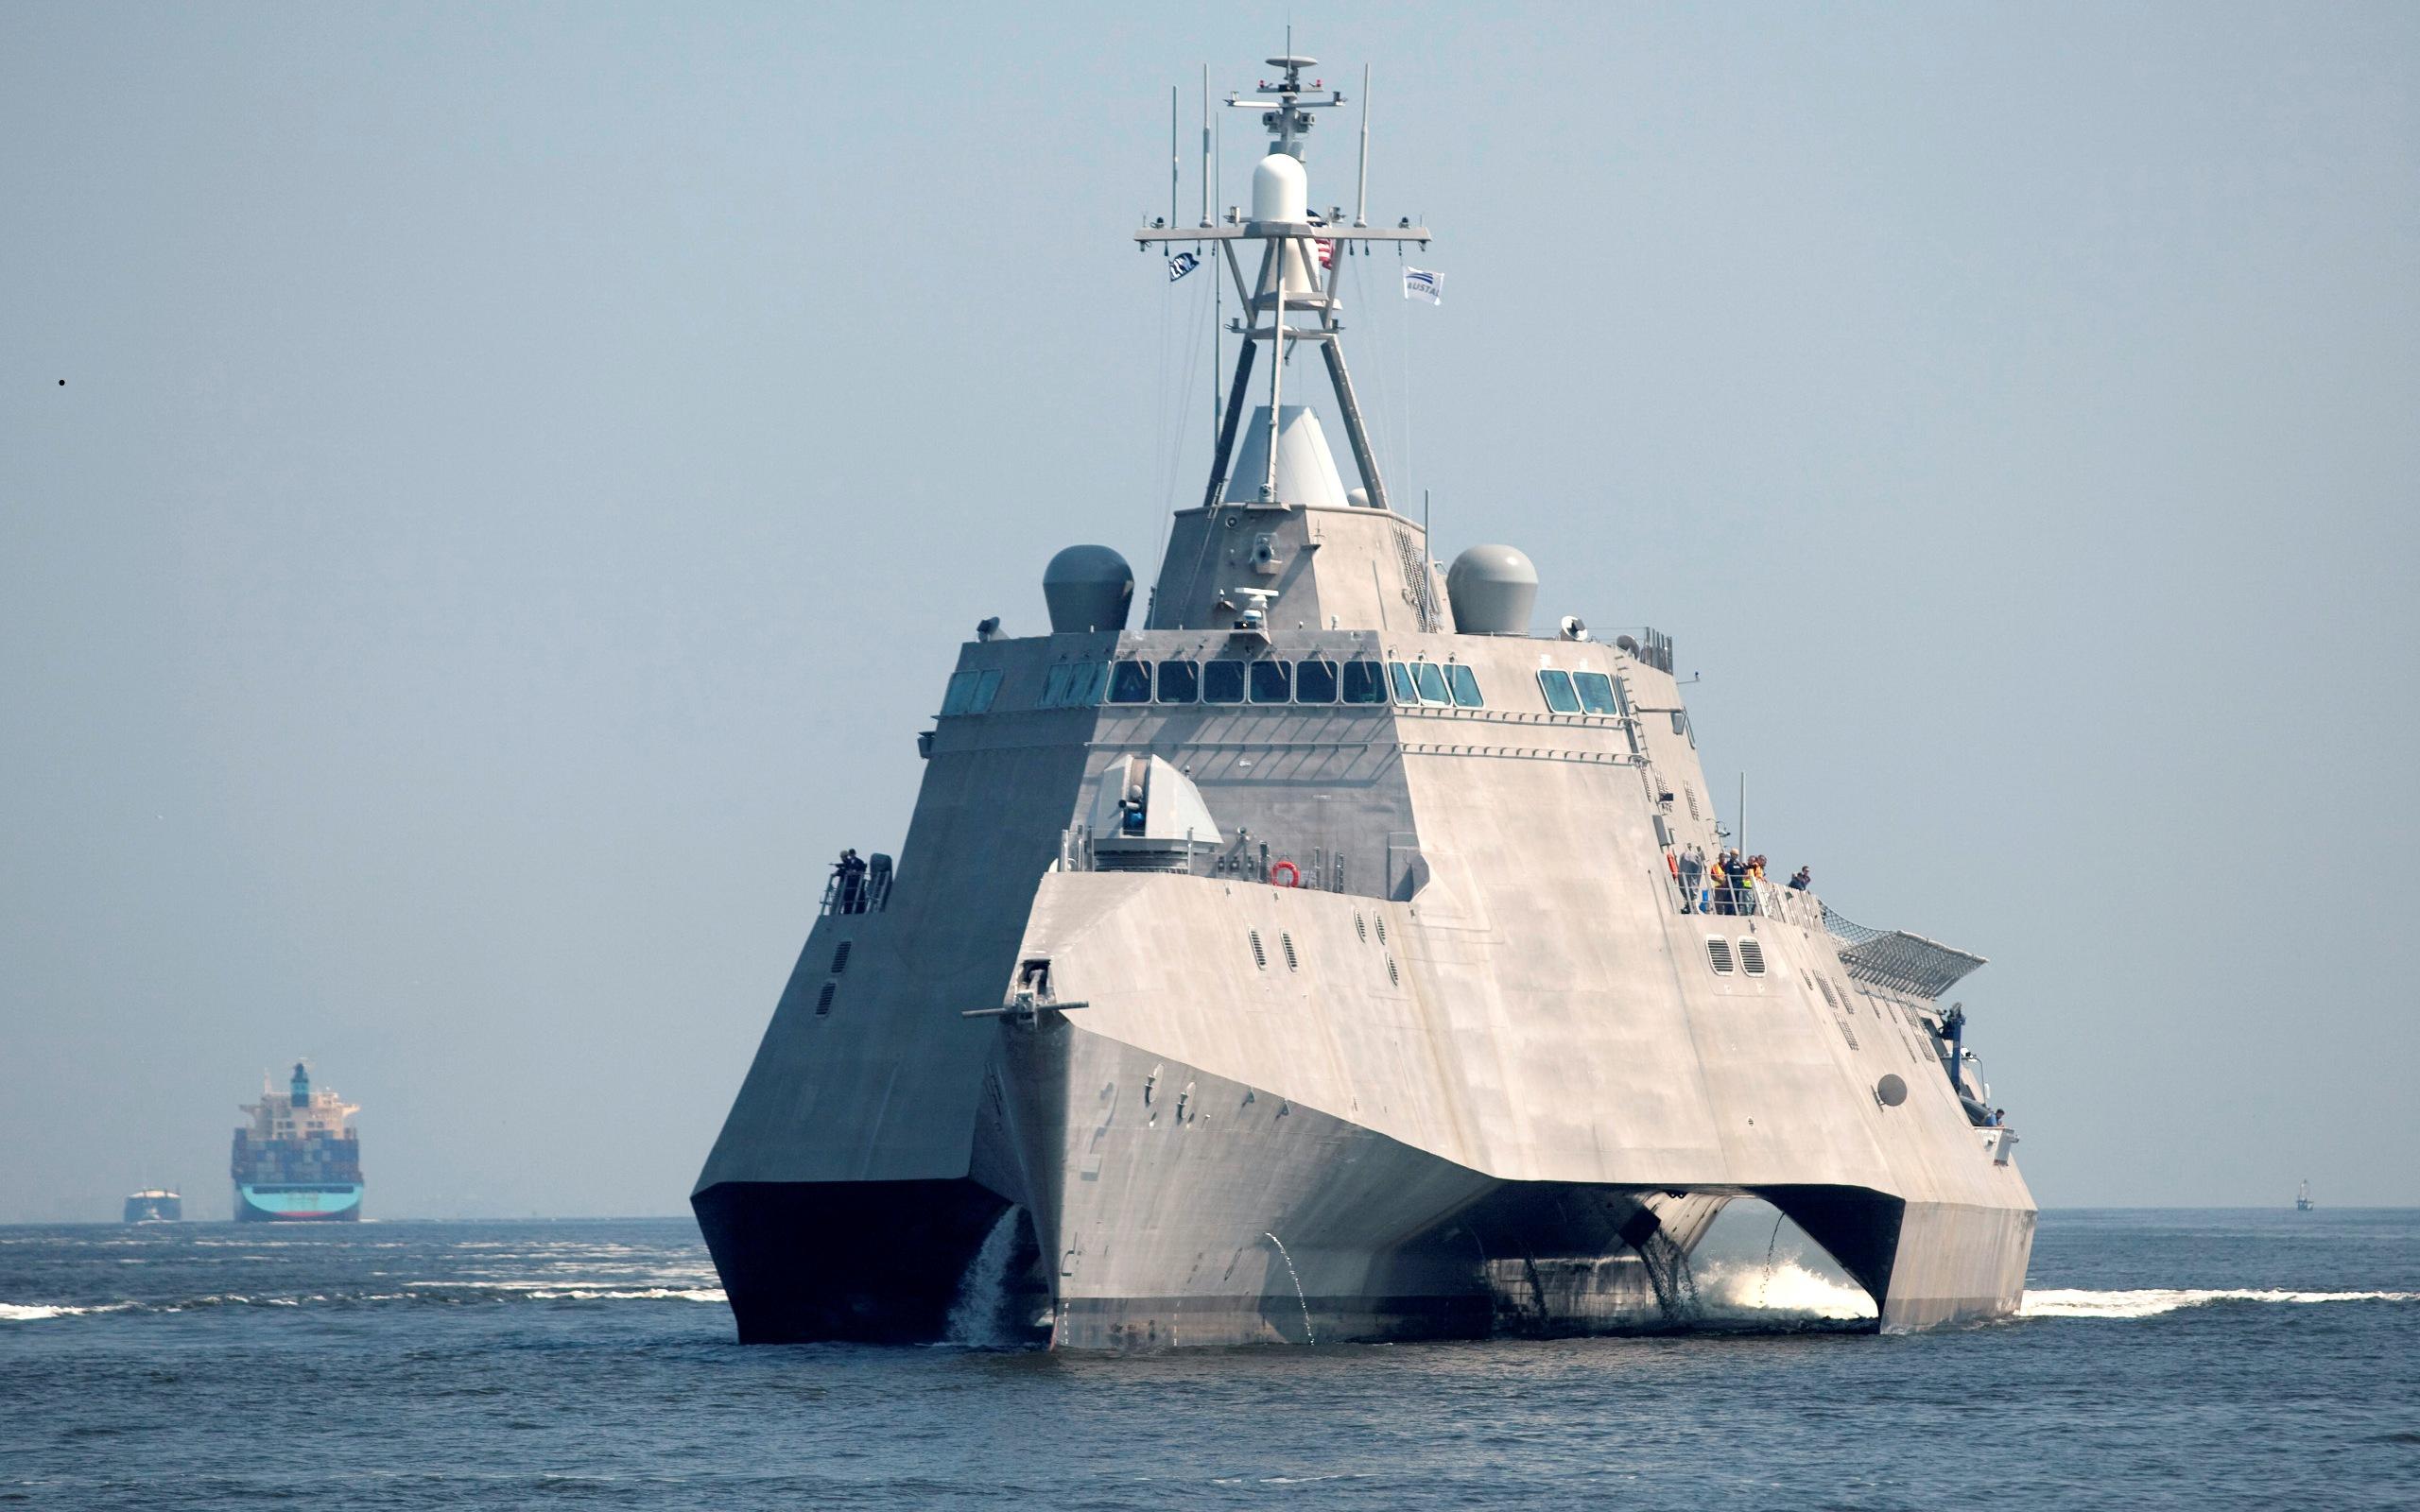 Ships ship boat military navy n wallpaper | 2560x1600 | 117532 ...